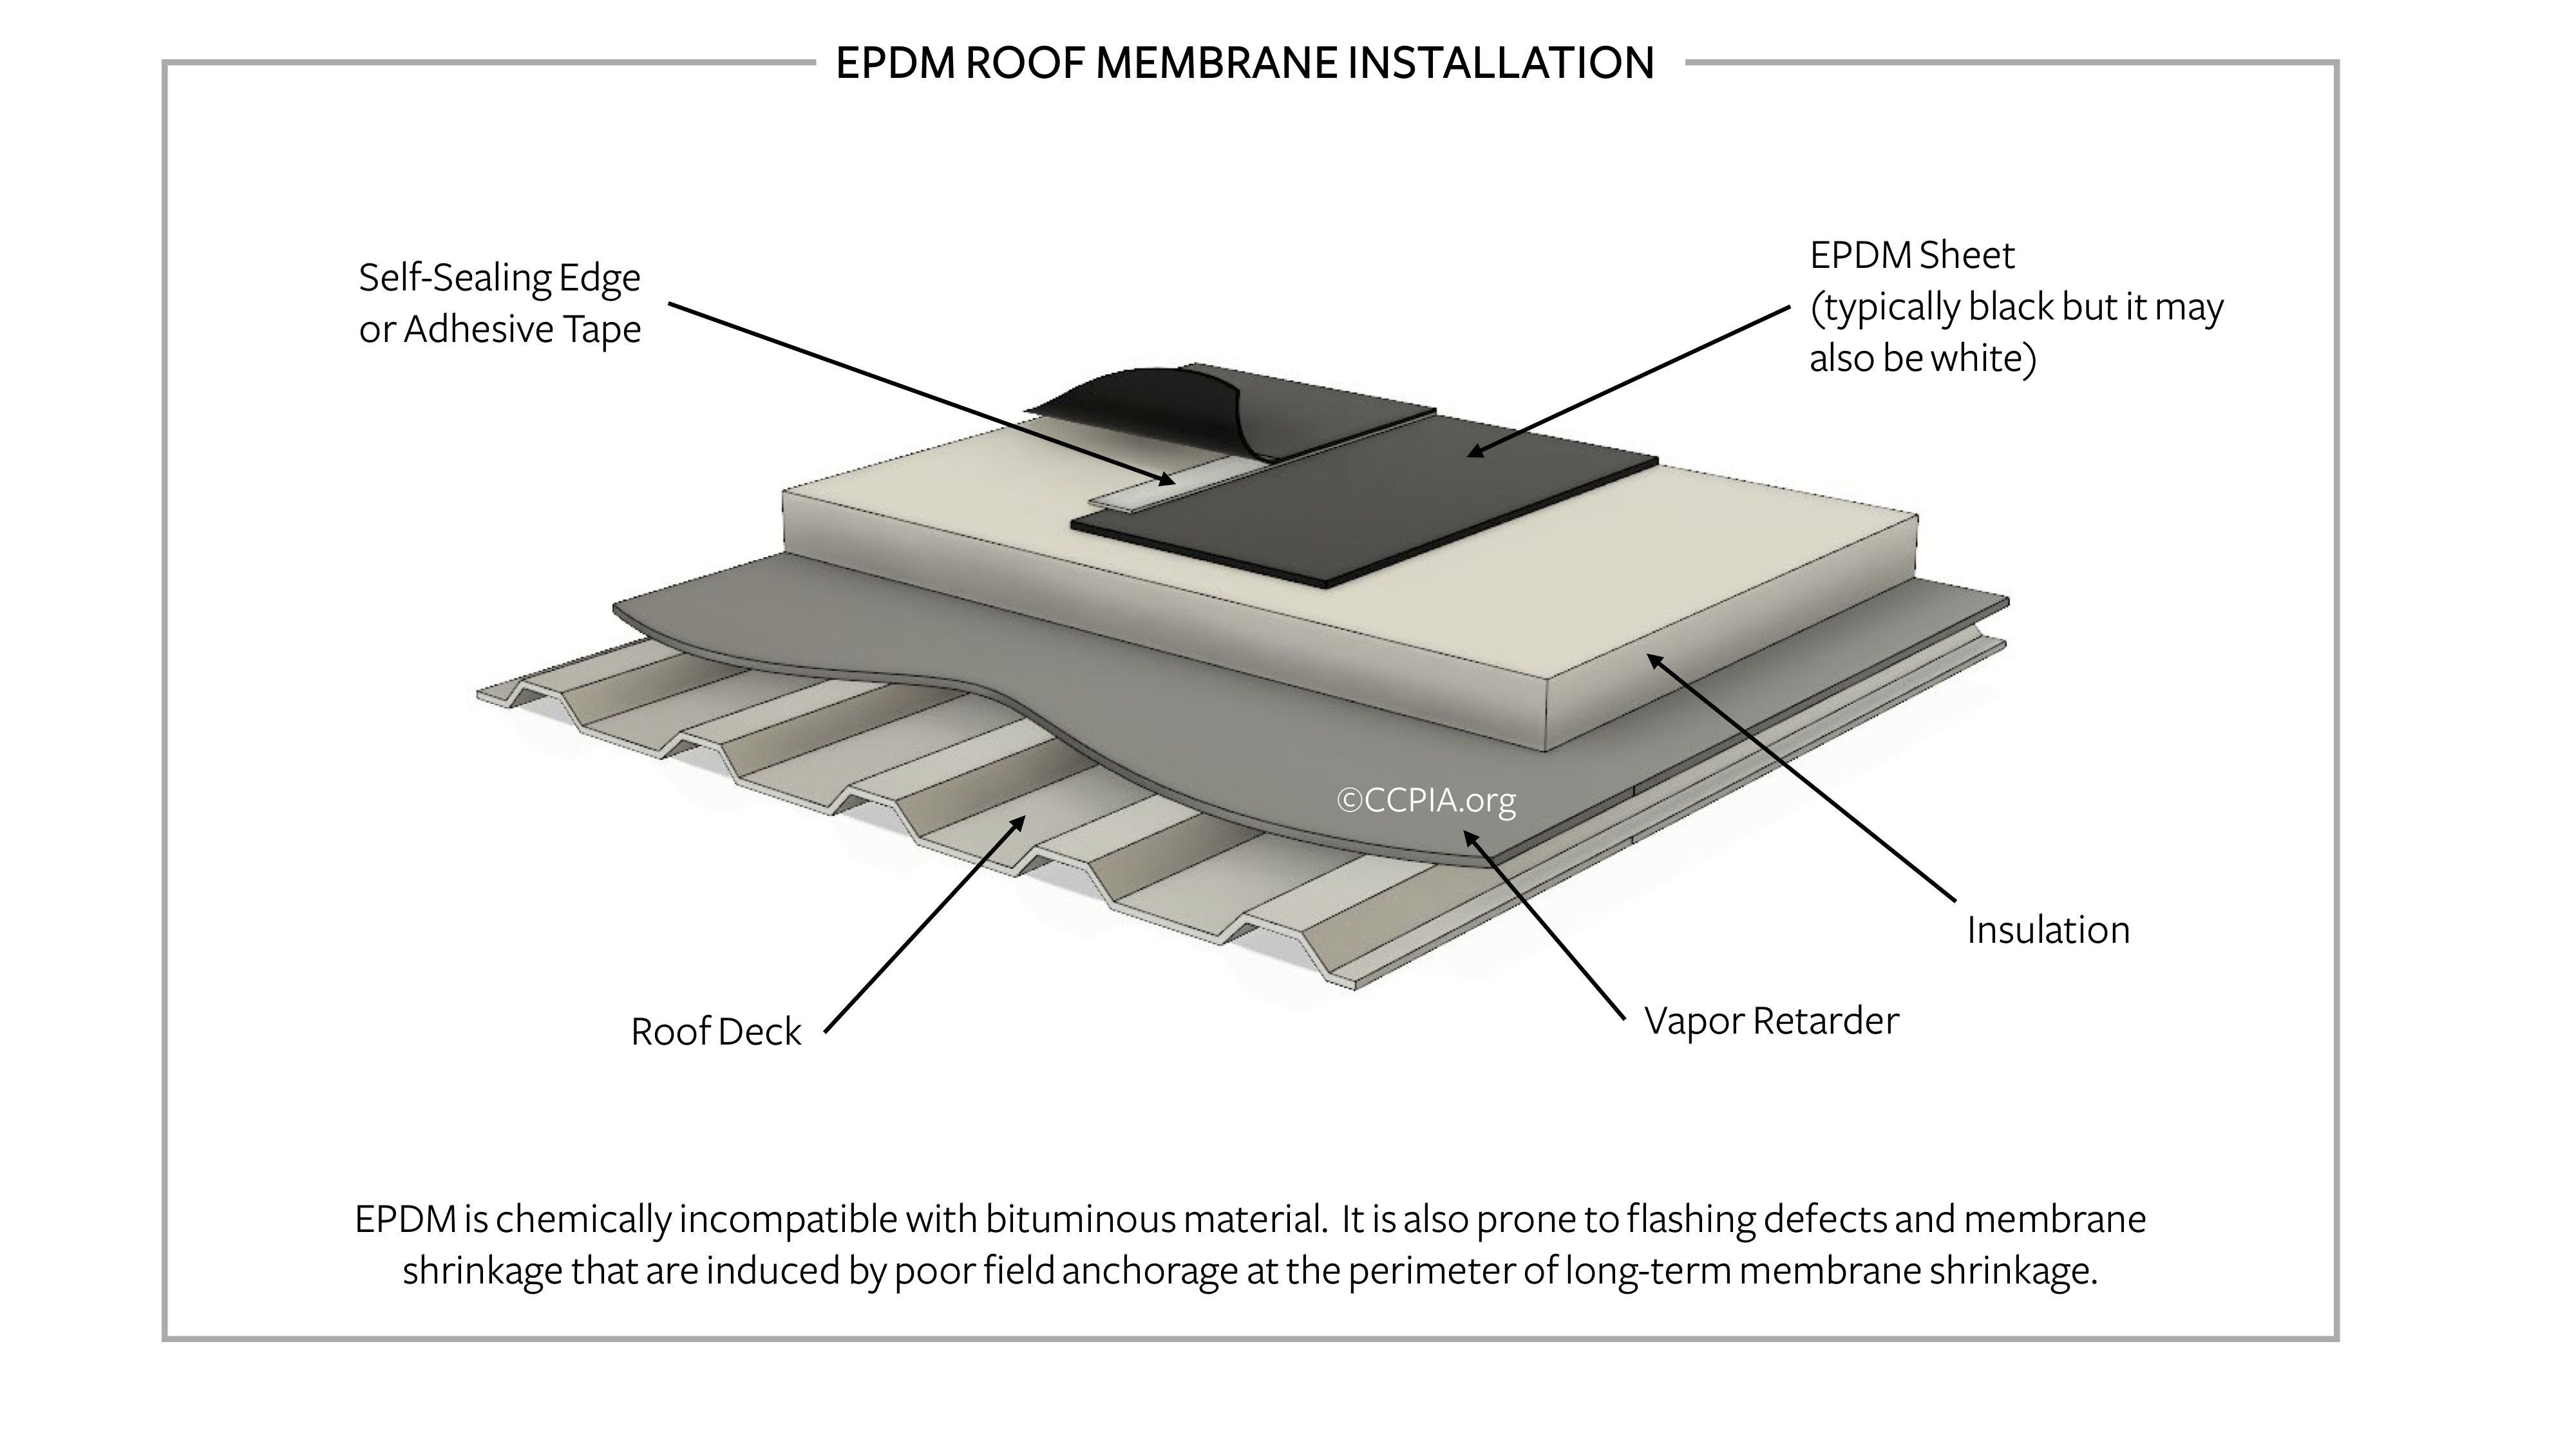 EPDM roof membrane installation.